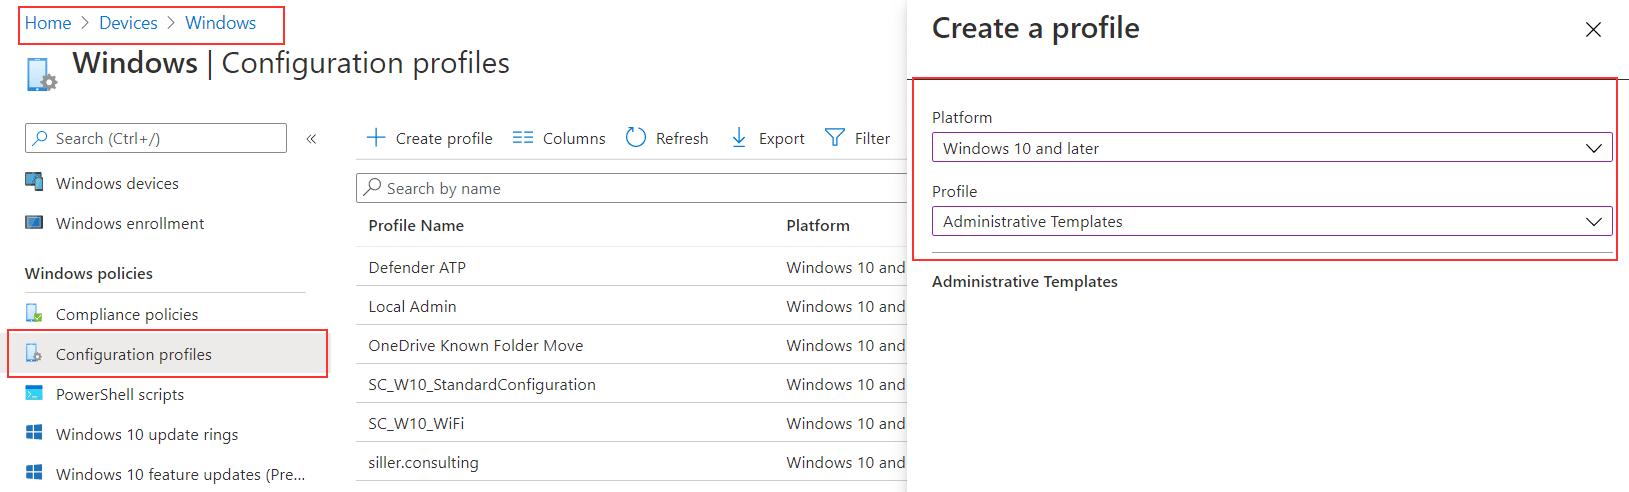 Microsoft Intune - Known Folder Move OneDrive-Intune